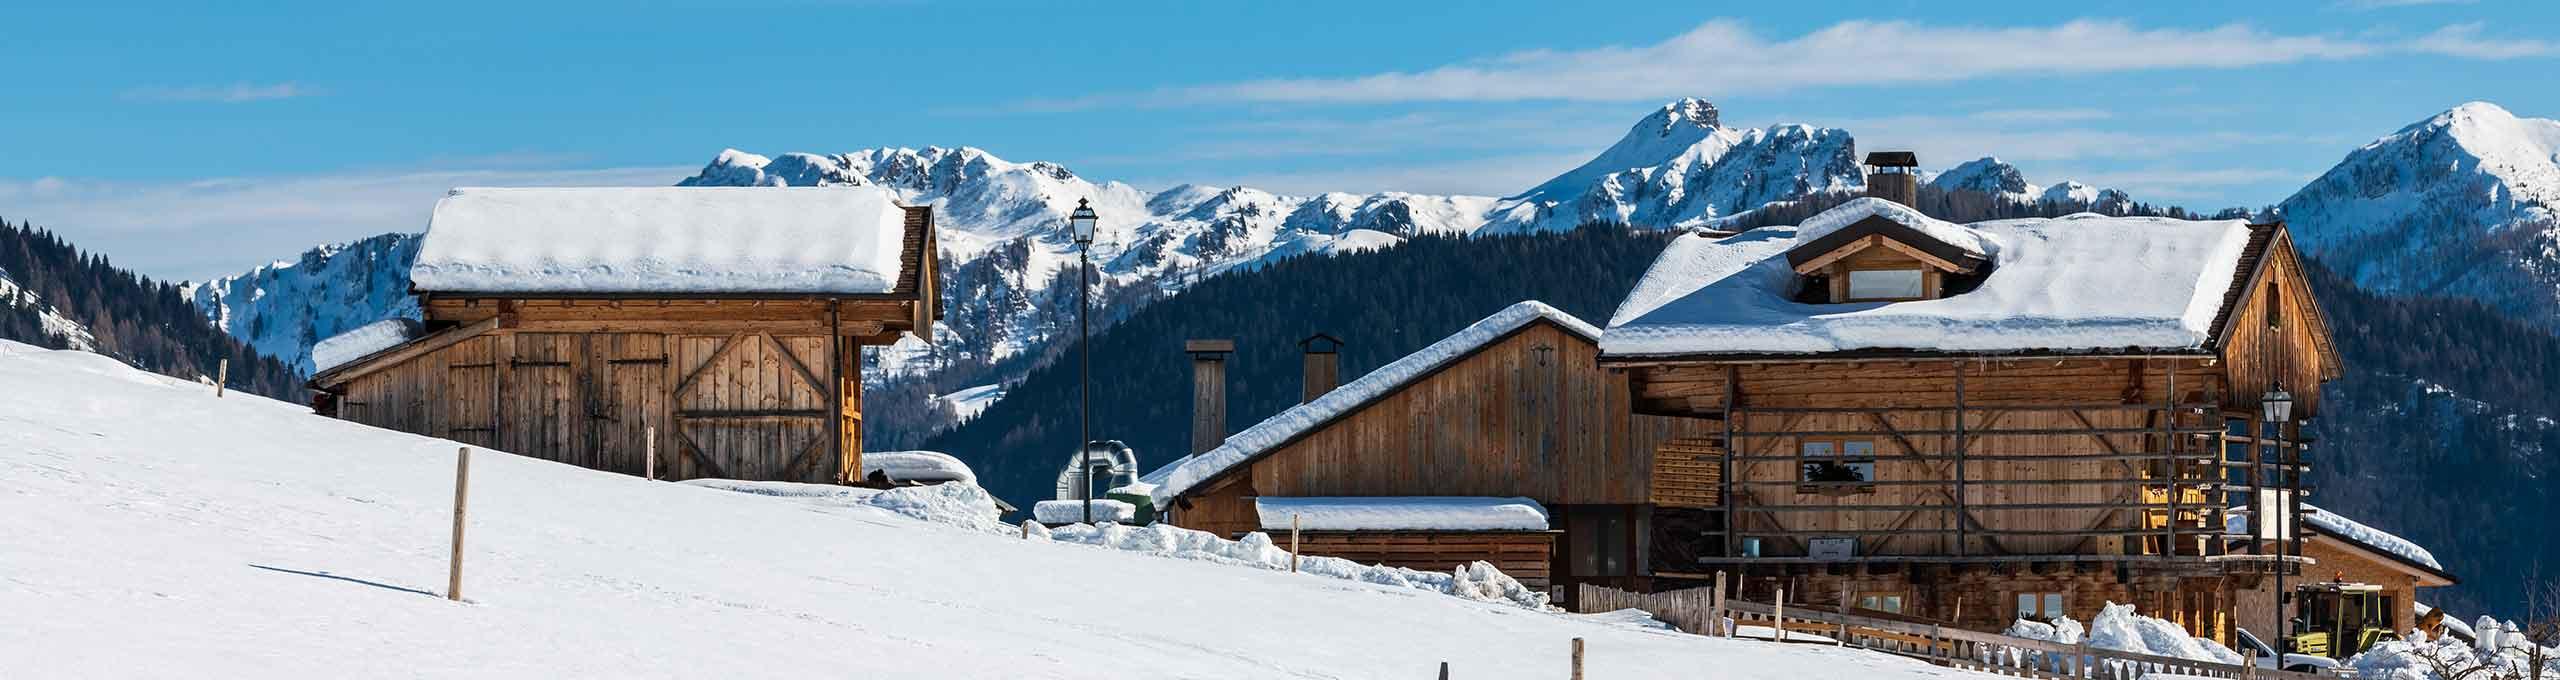 Sauris, Udine, Alpi Carniche